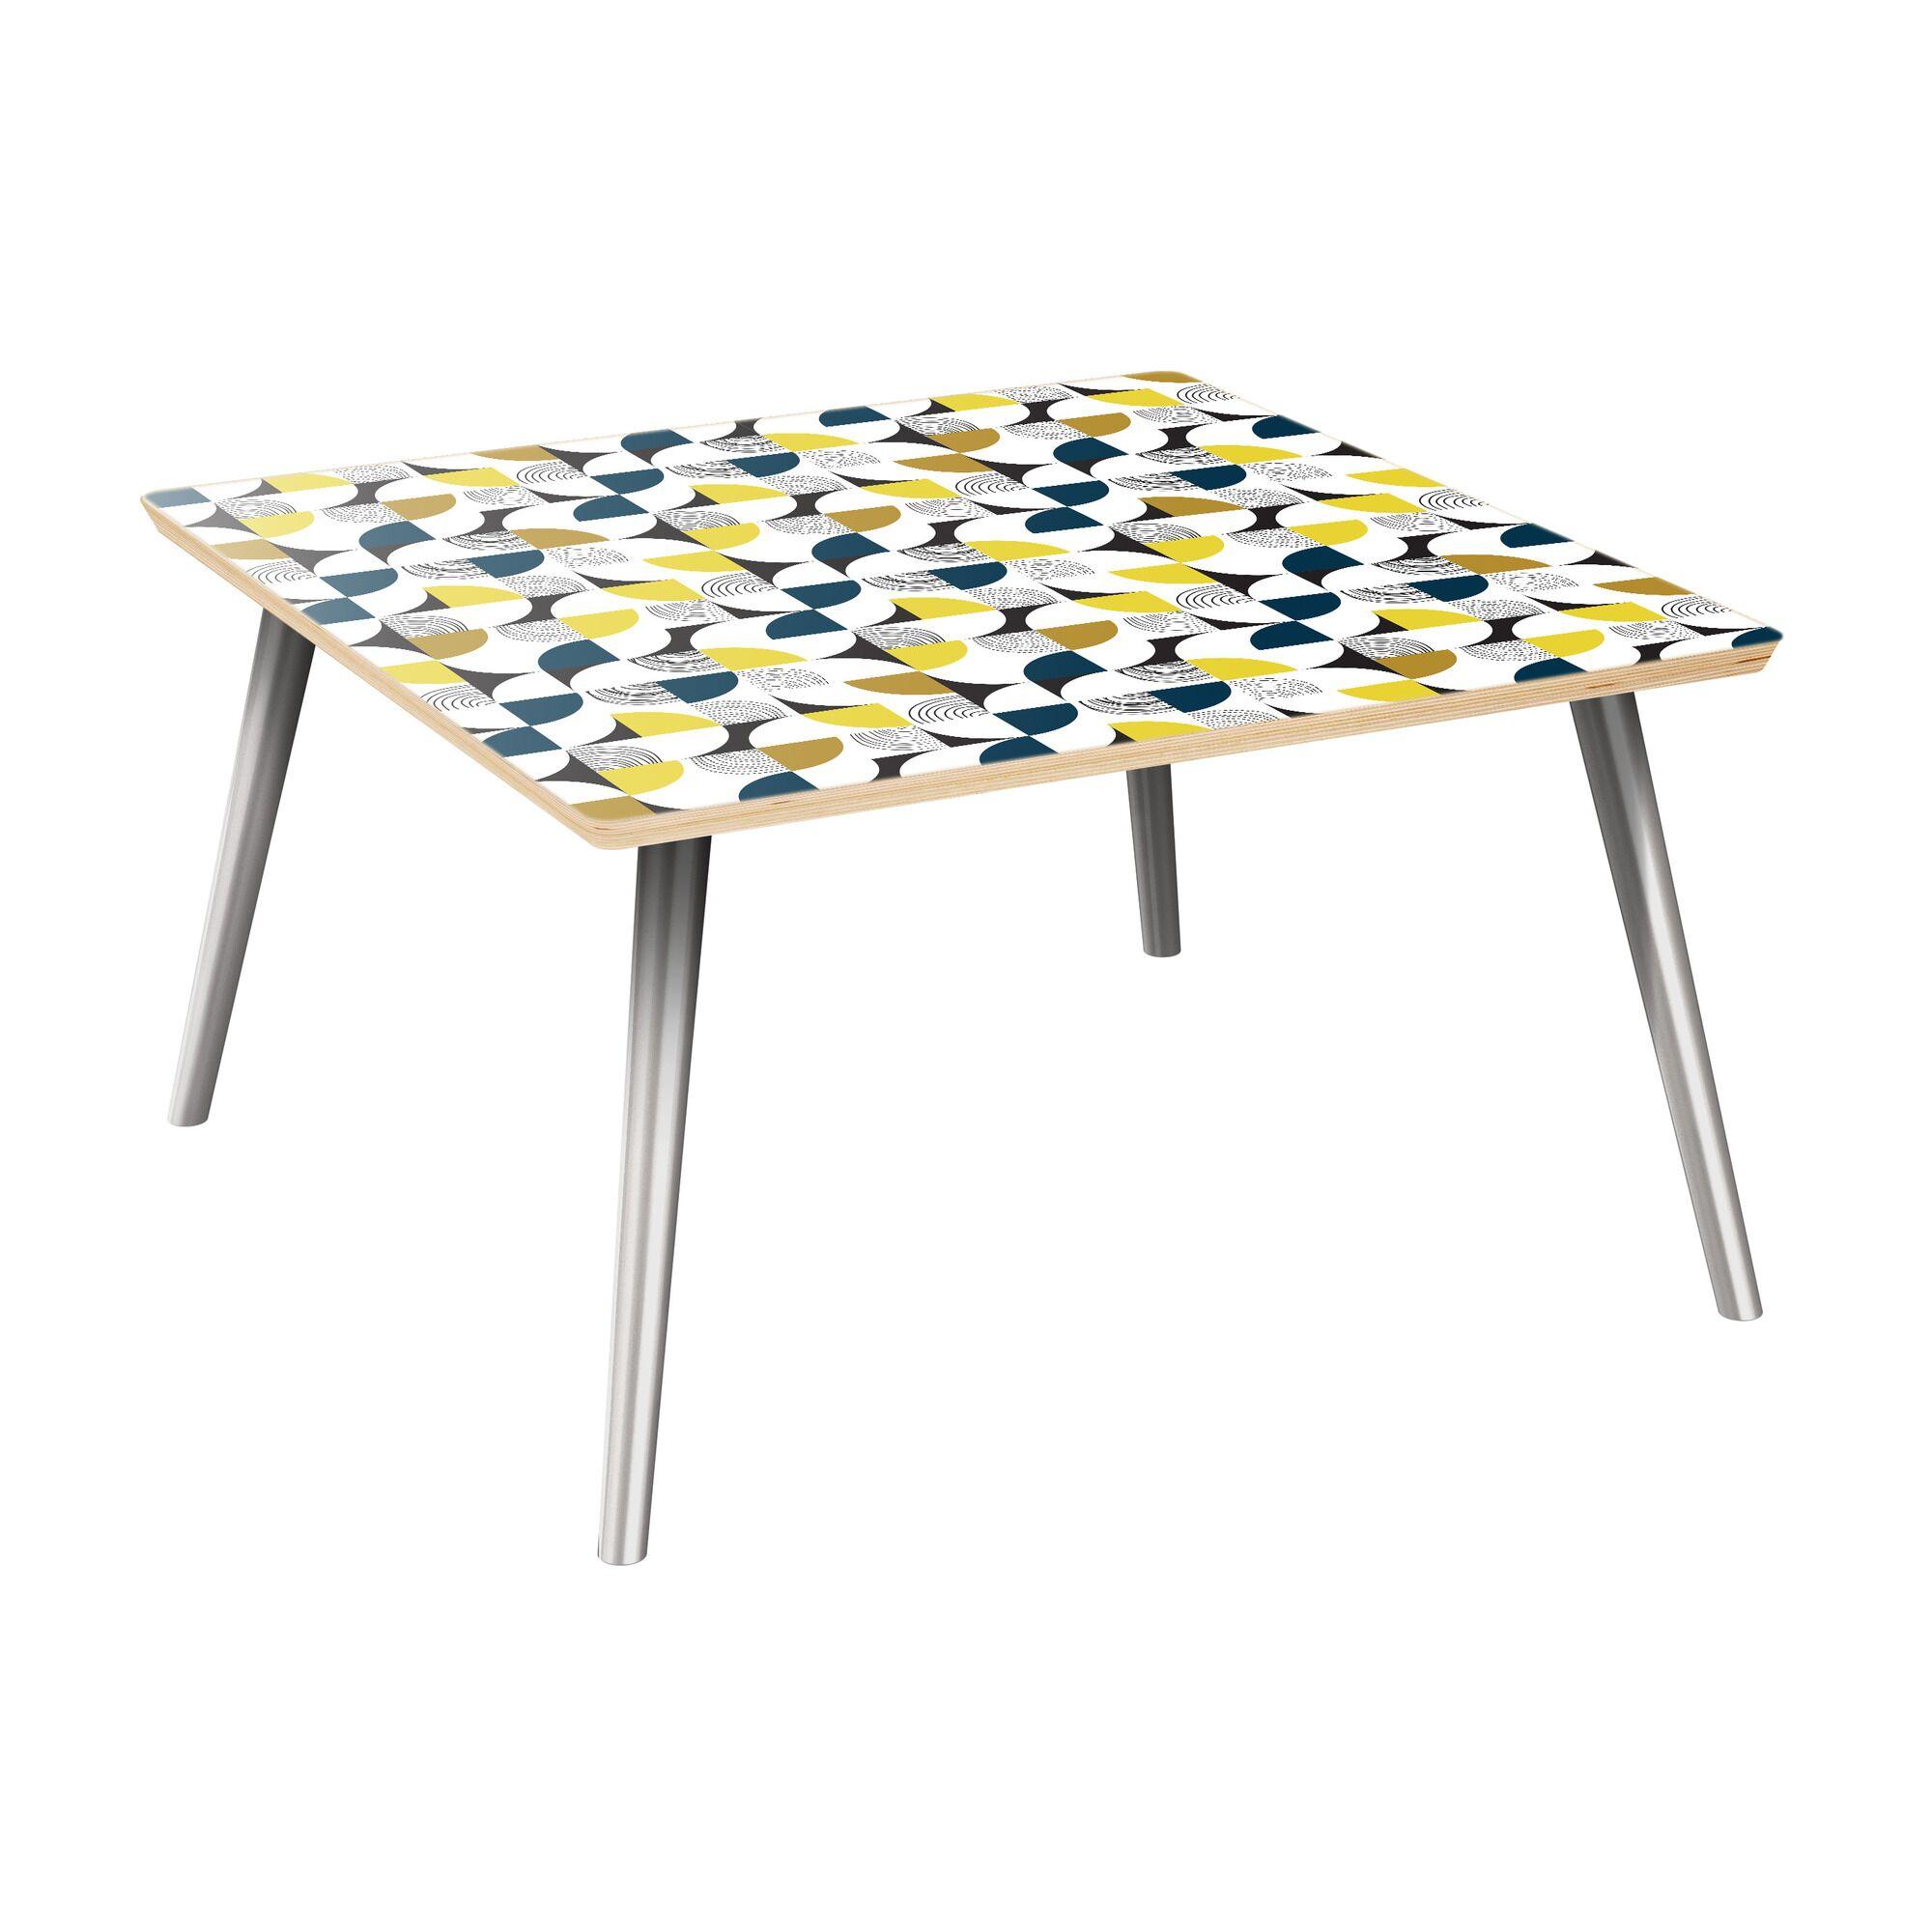 Kyoko Coffee Table Table Top Color: Natural, Table Base Color: Chrome